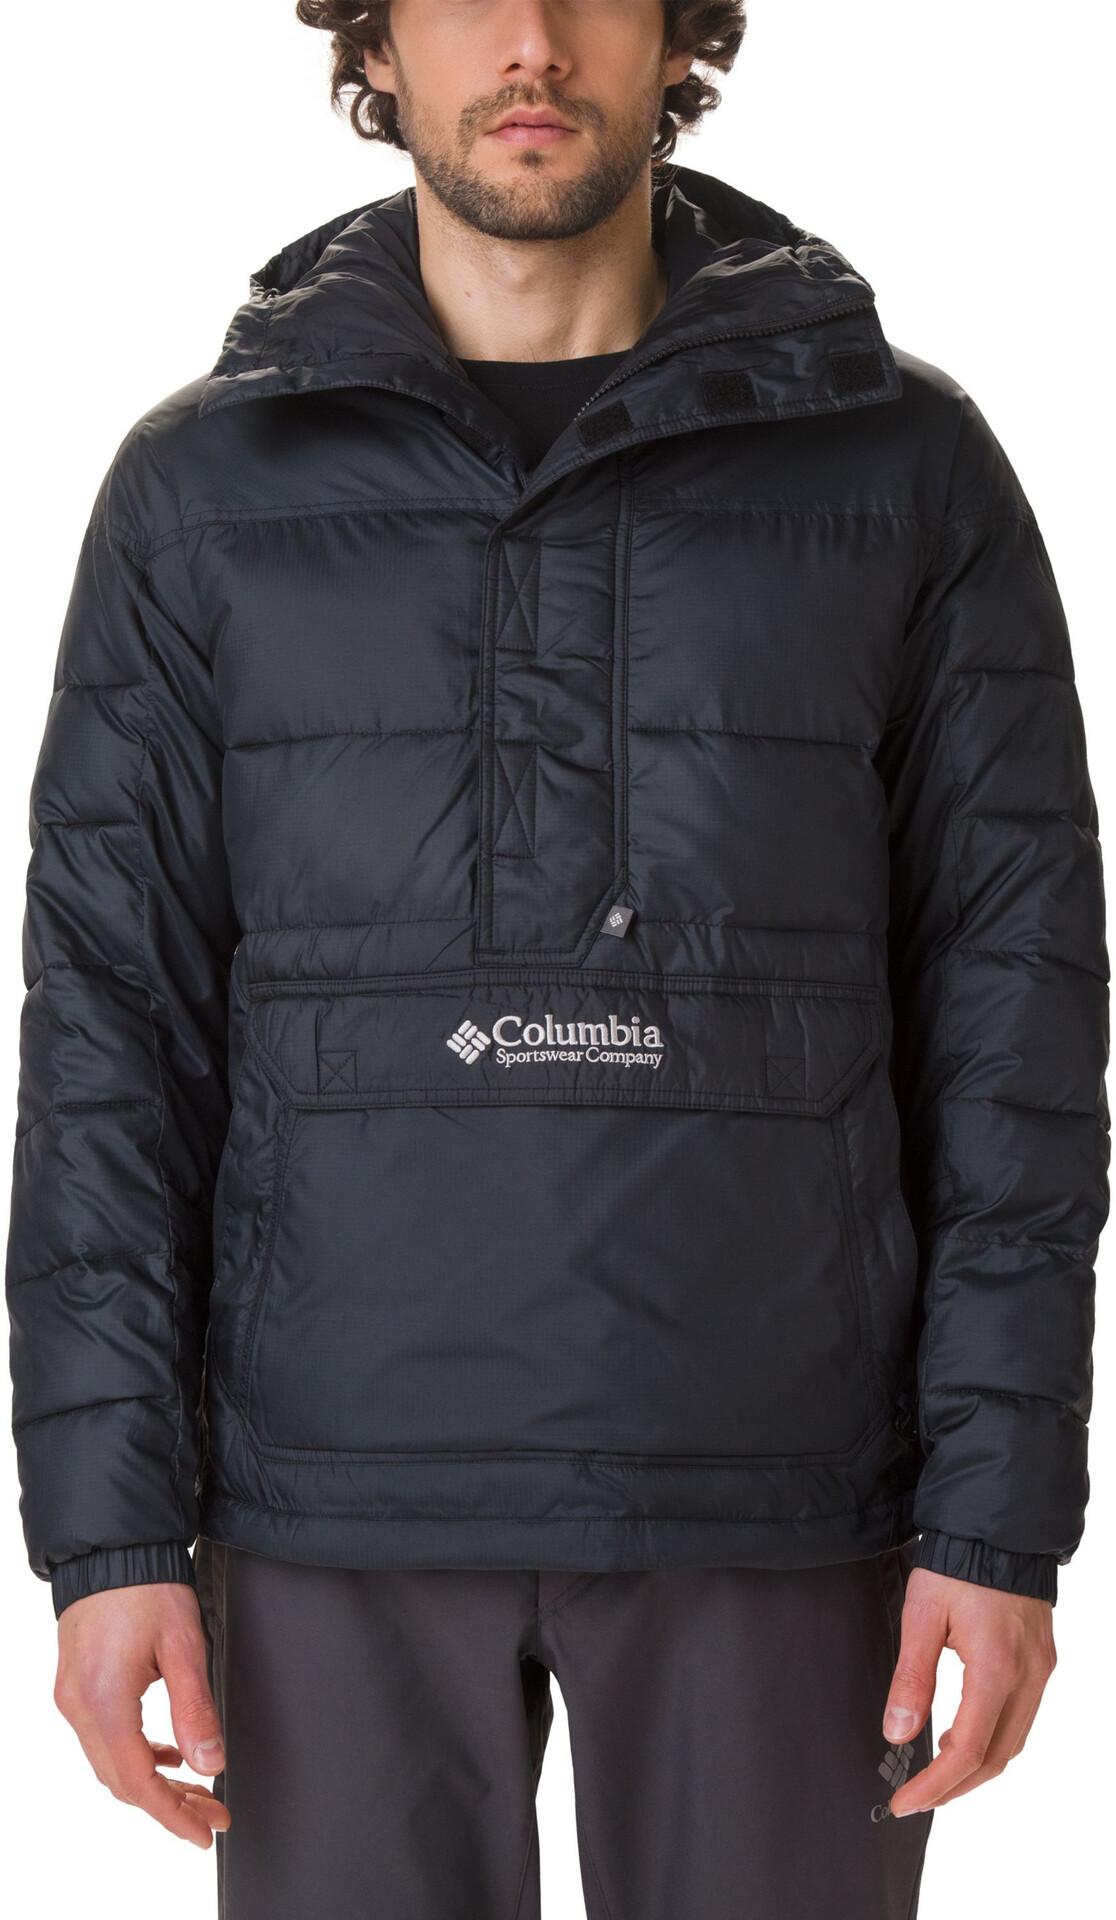 Columbia Columbia Lodge Giacca Pullover Uomo, black